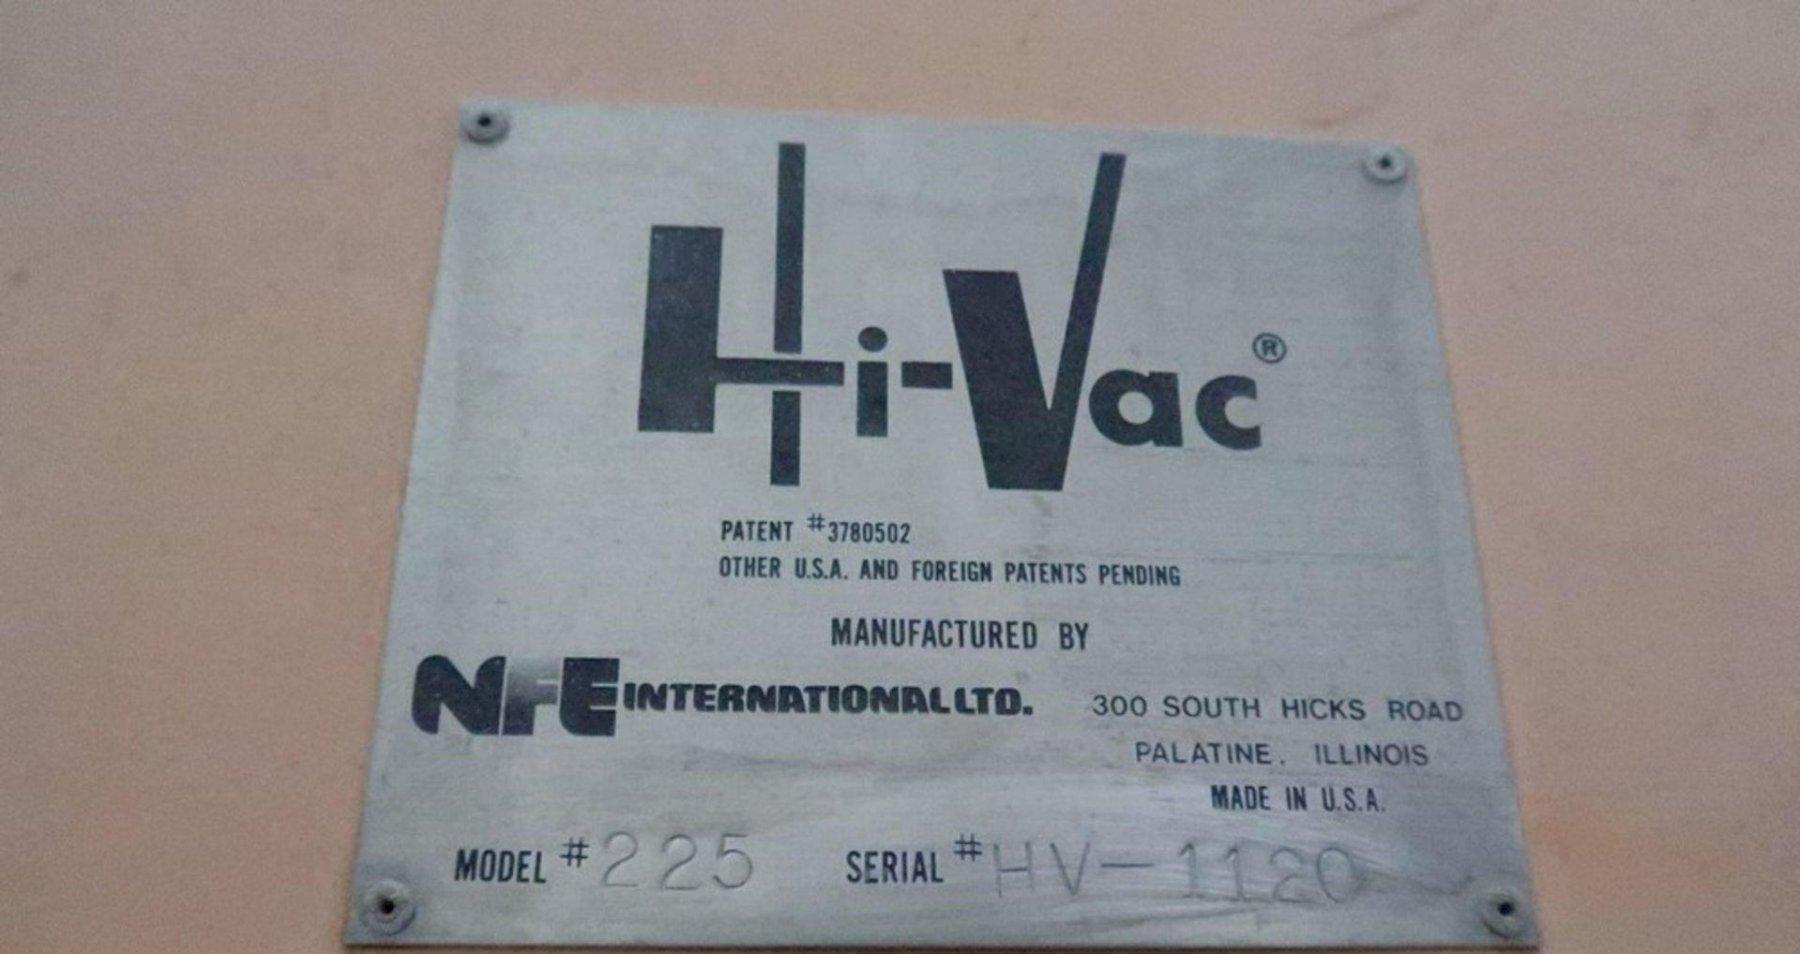 HI-VAC MODEL #225 PORTABLE VACUUM SYSTEM: STOCK #15072